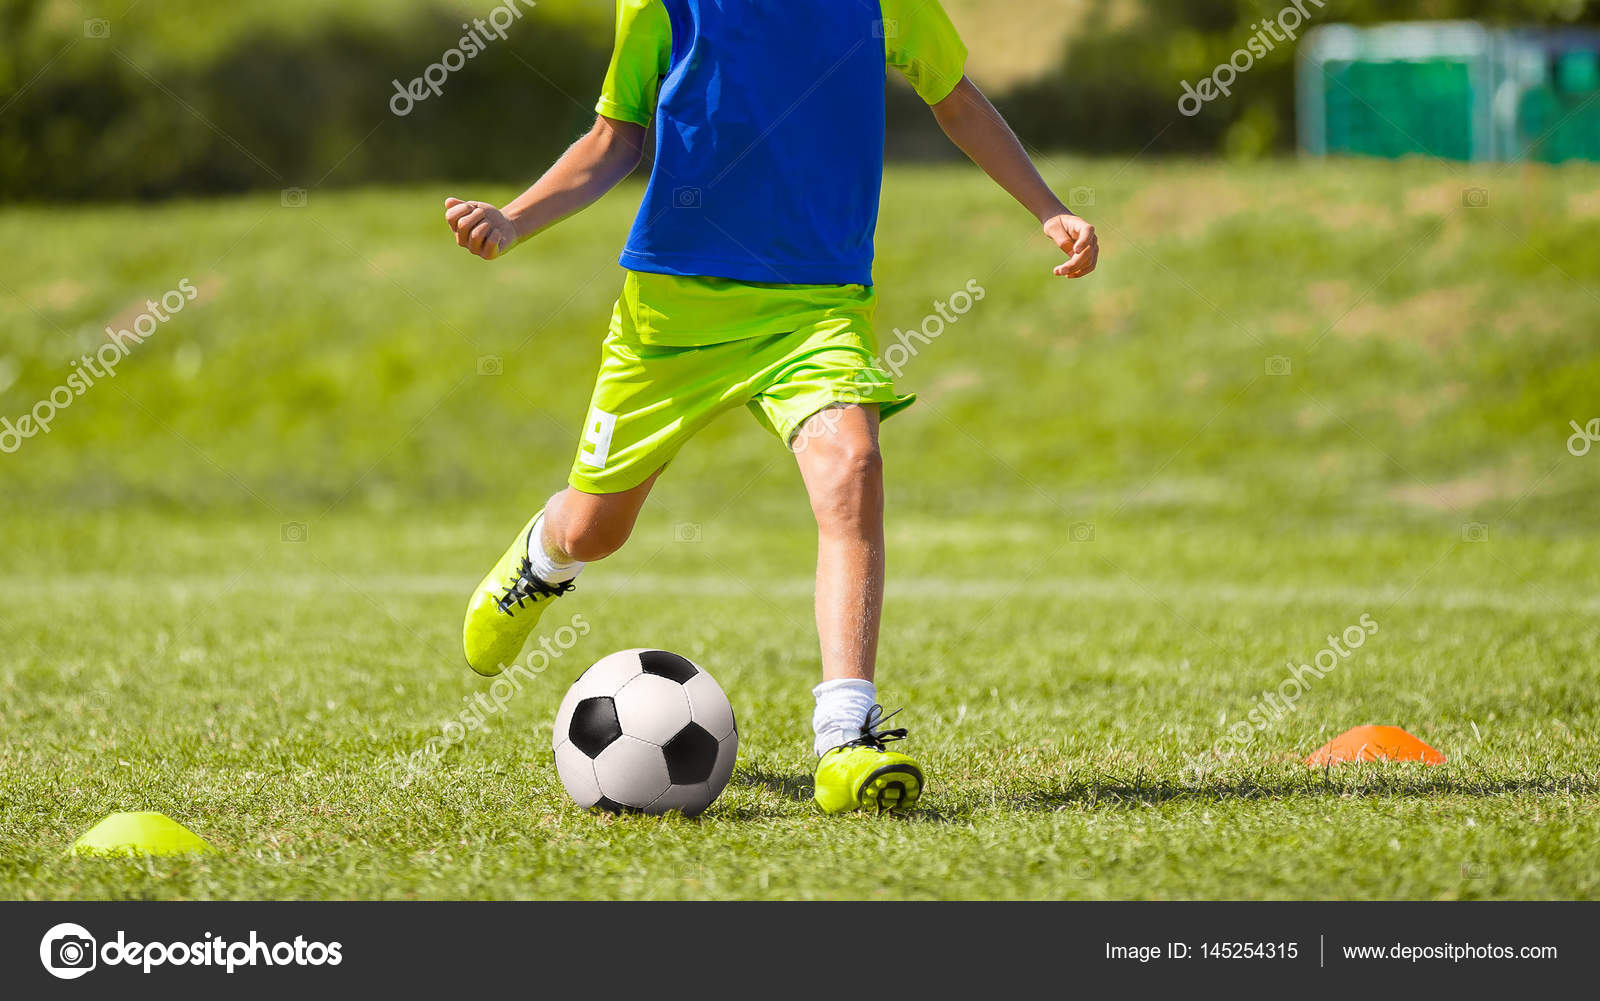 Junge Fussballer Treten Ball Am Fussballplatz Junge In